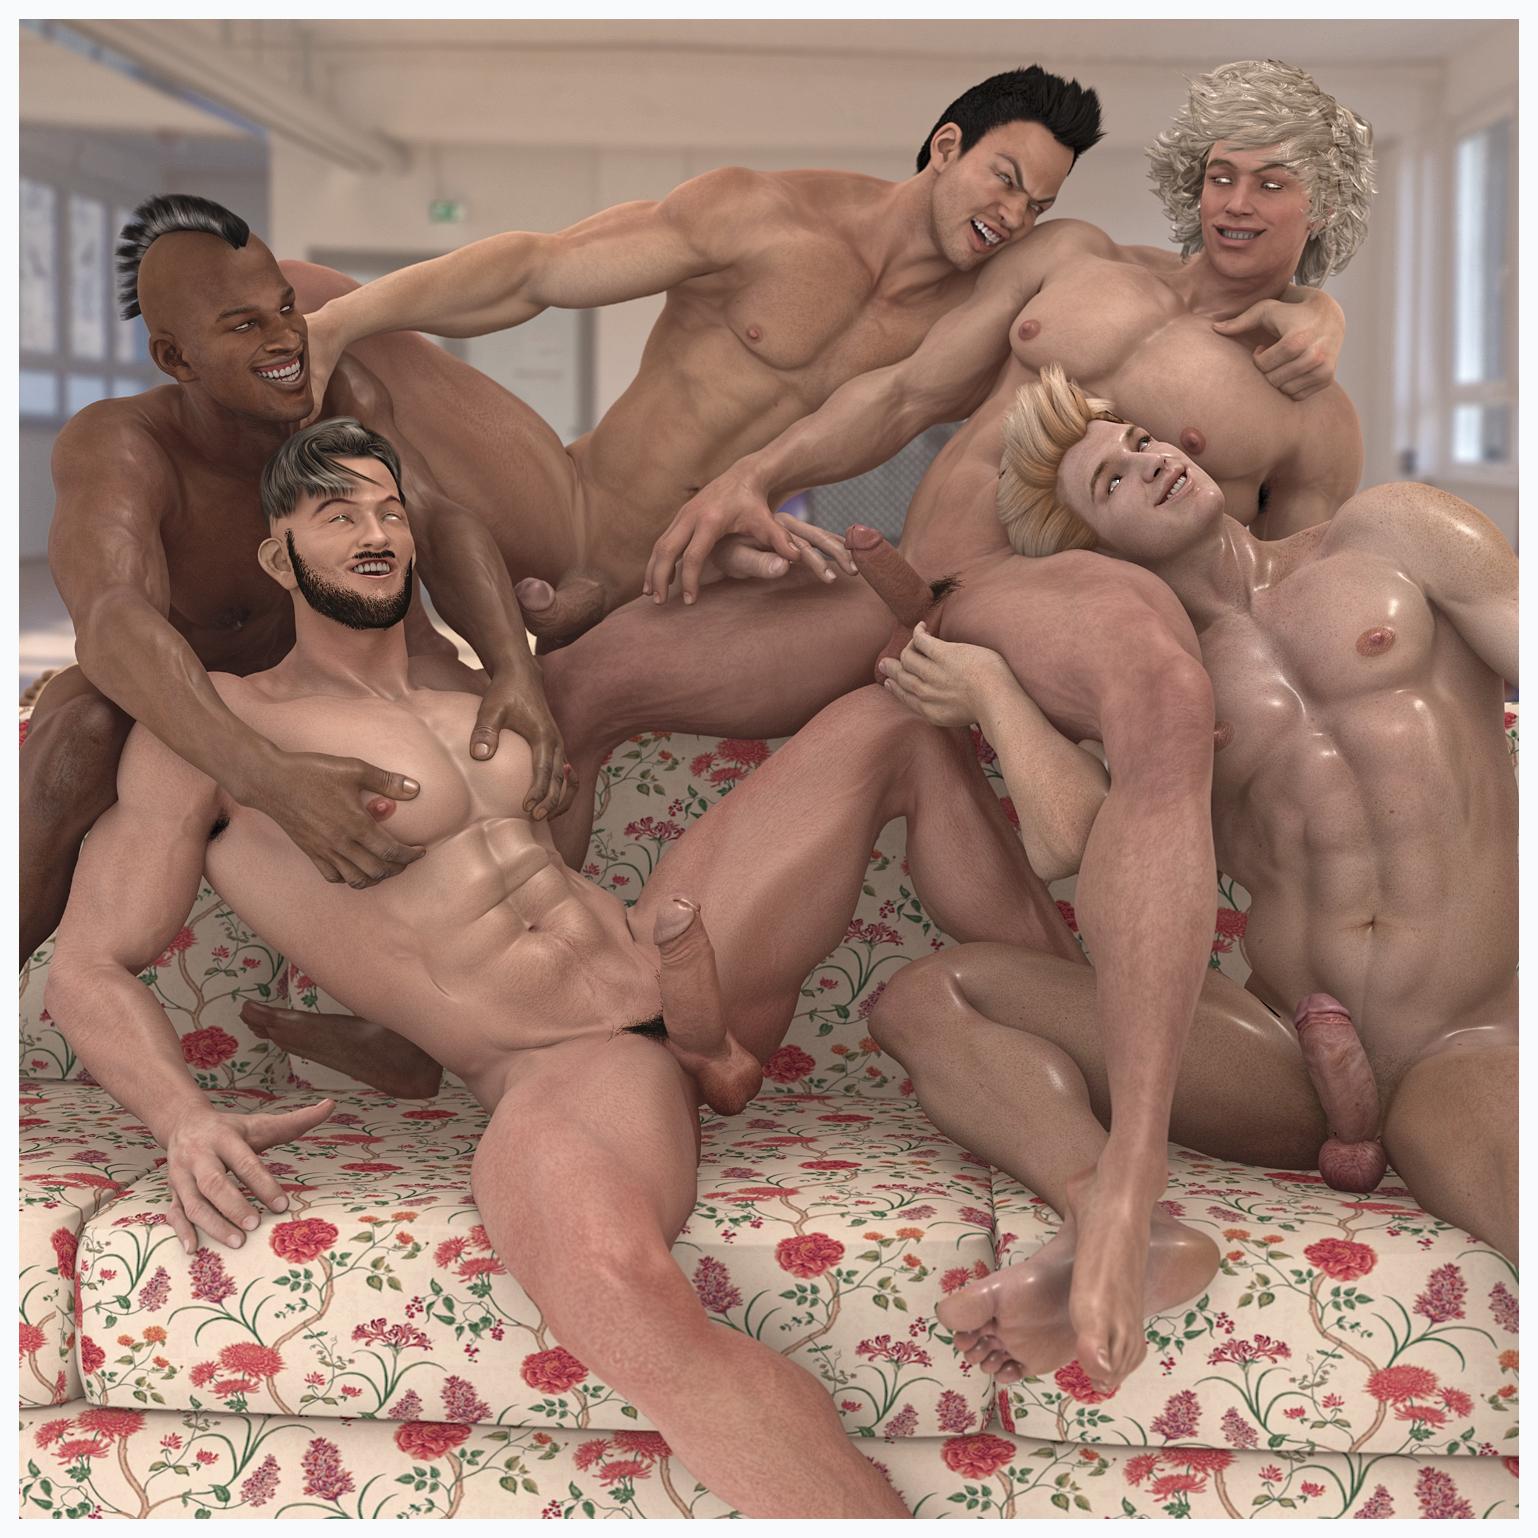 allison stokke photos naked